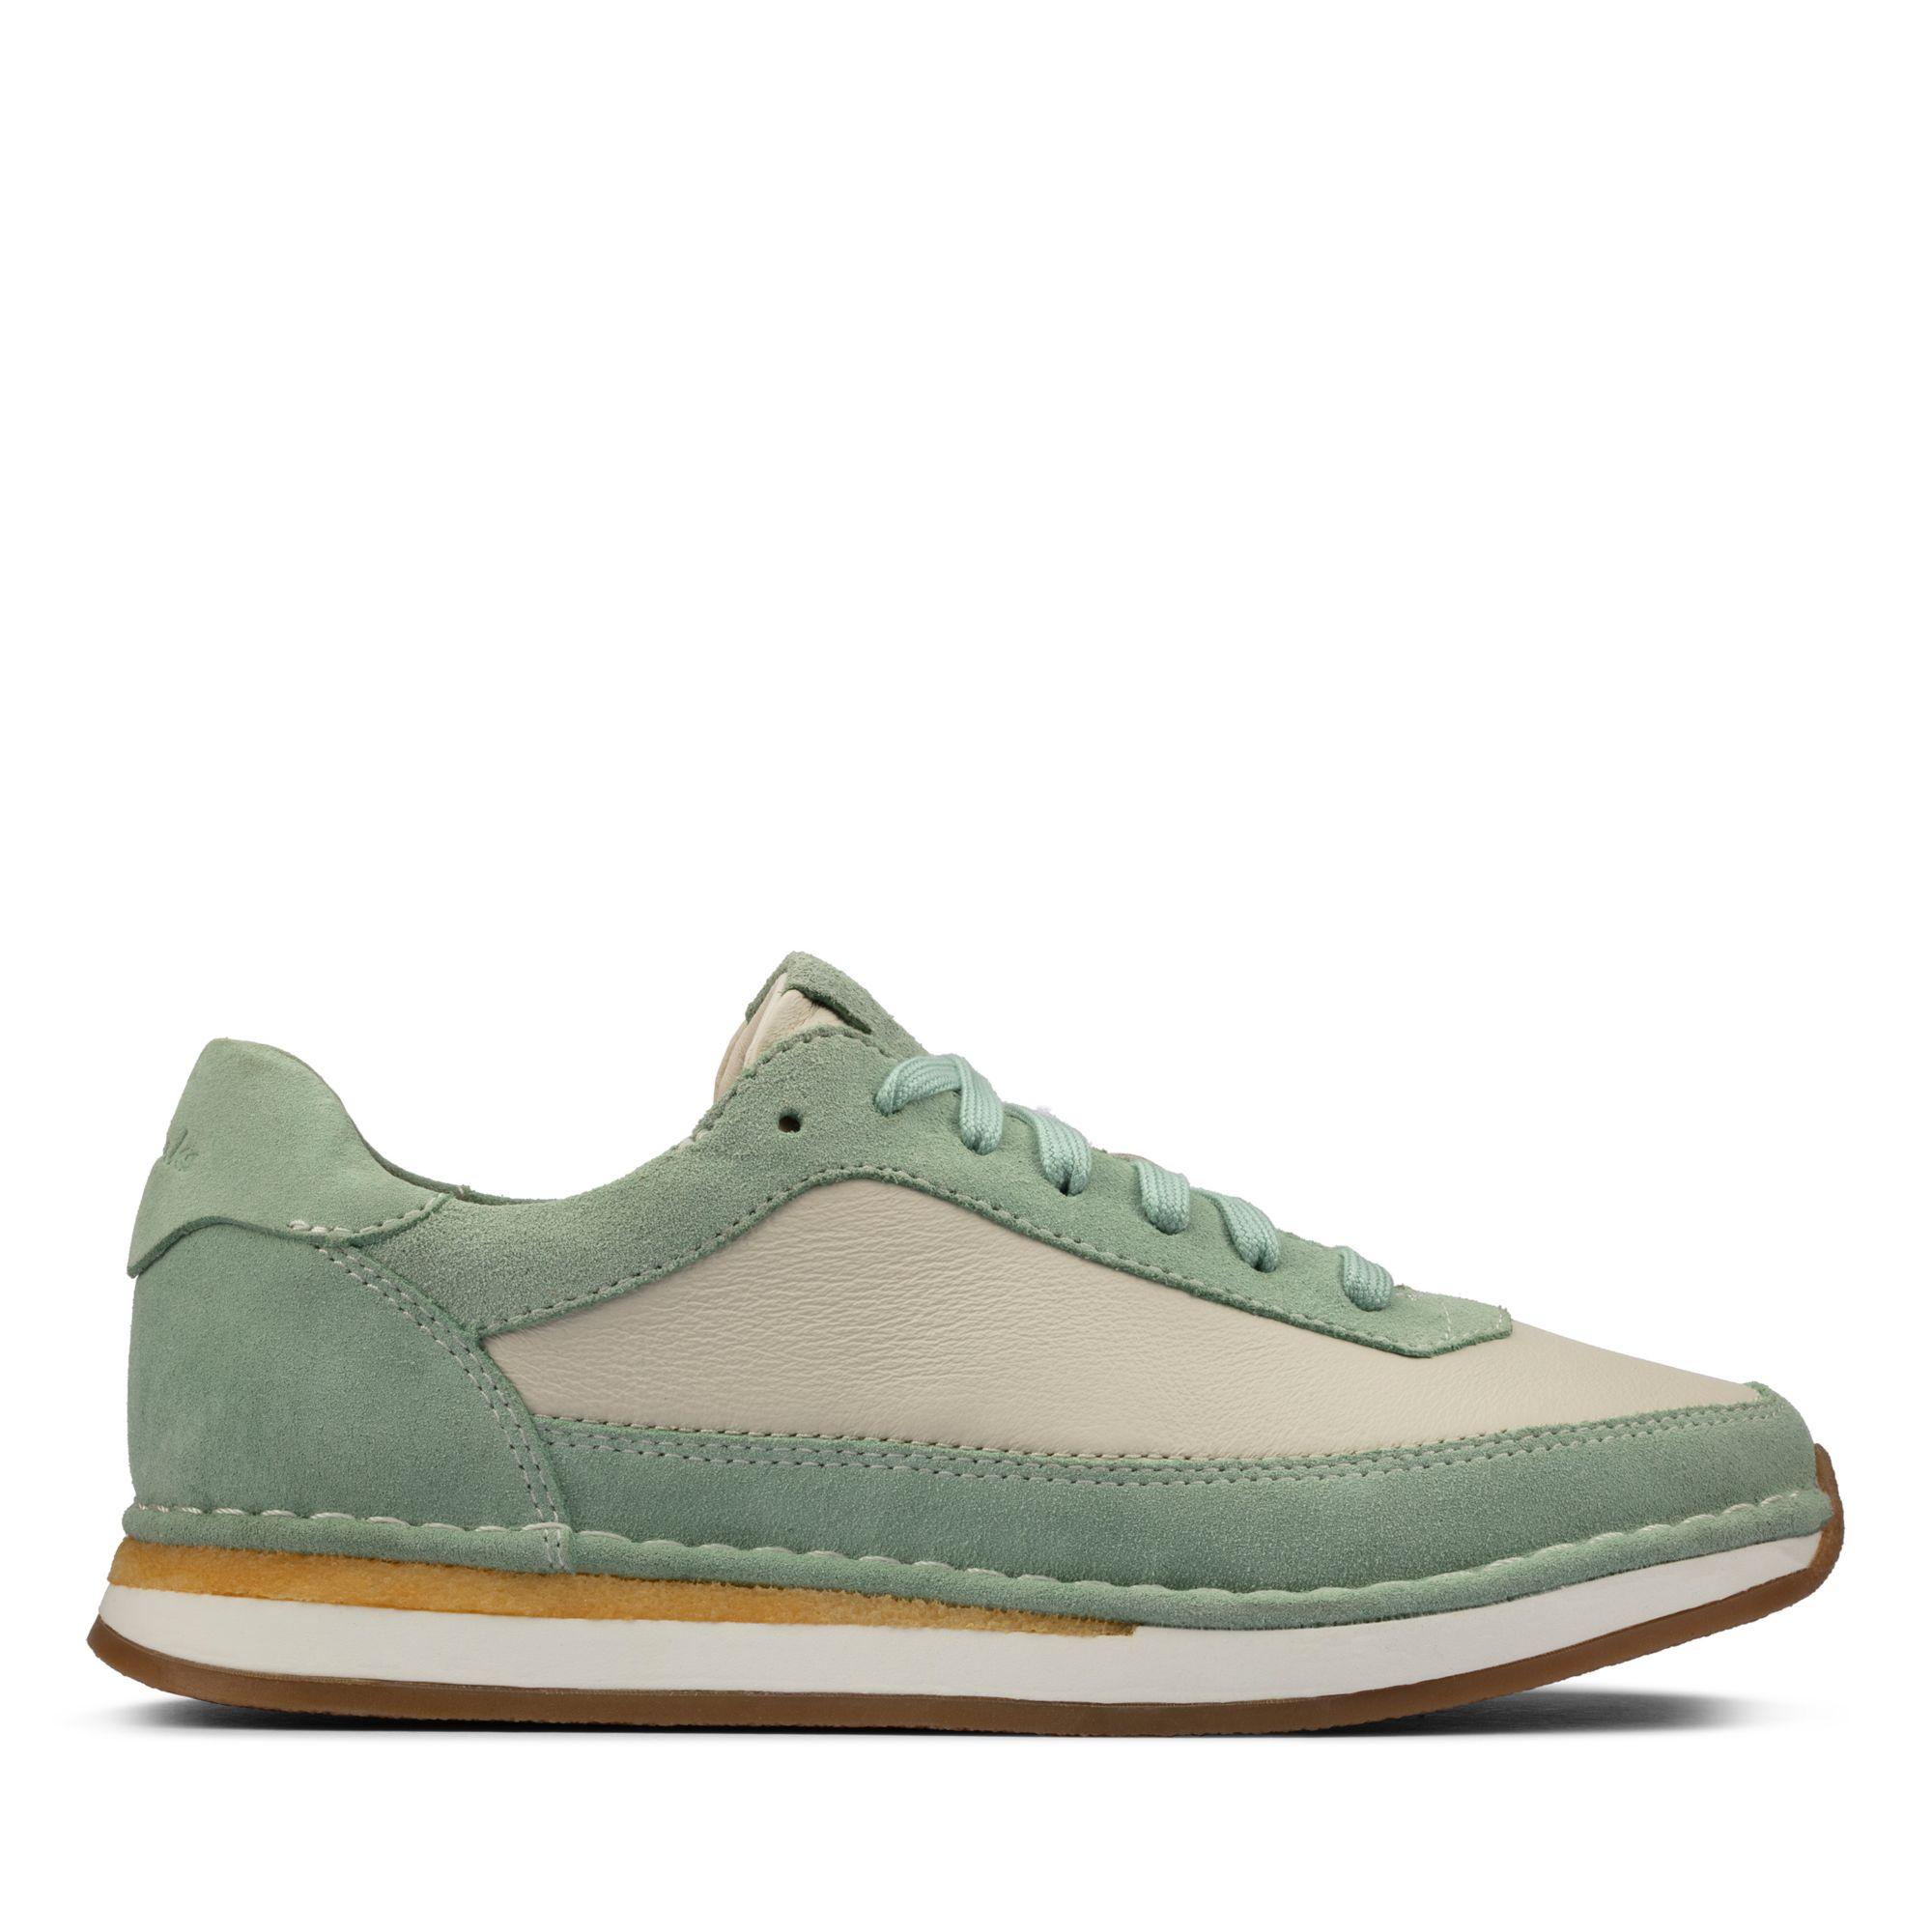 Clarks匠心之作-CraftRun Lace經典複刻手工皮質休閒鞋(薄荷綠)